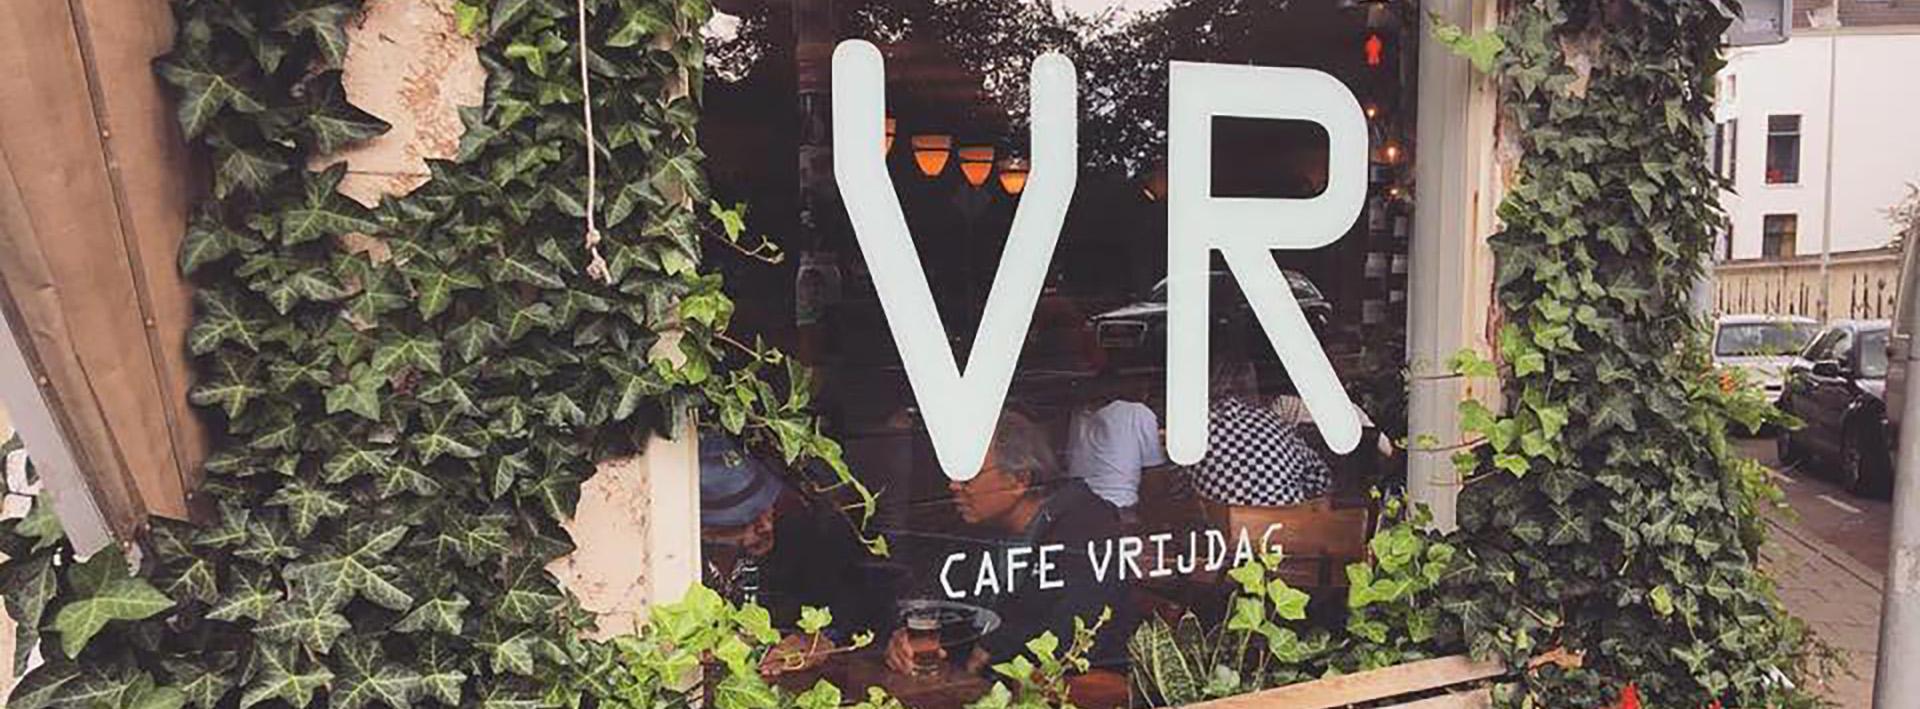 Cafe Vrijdag